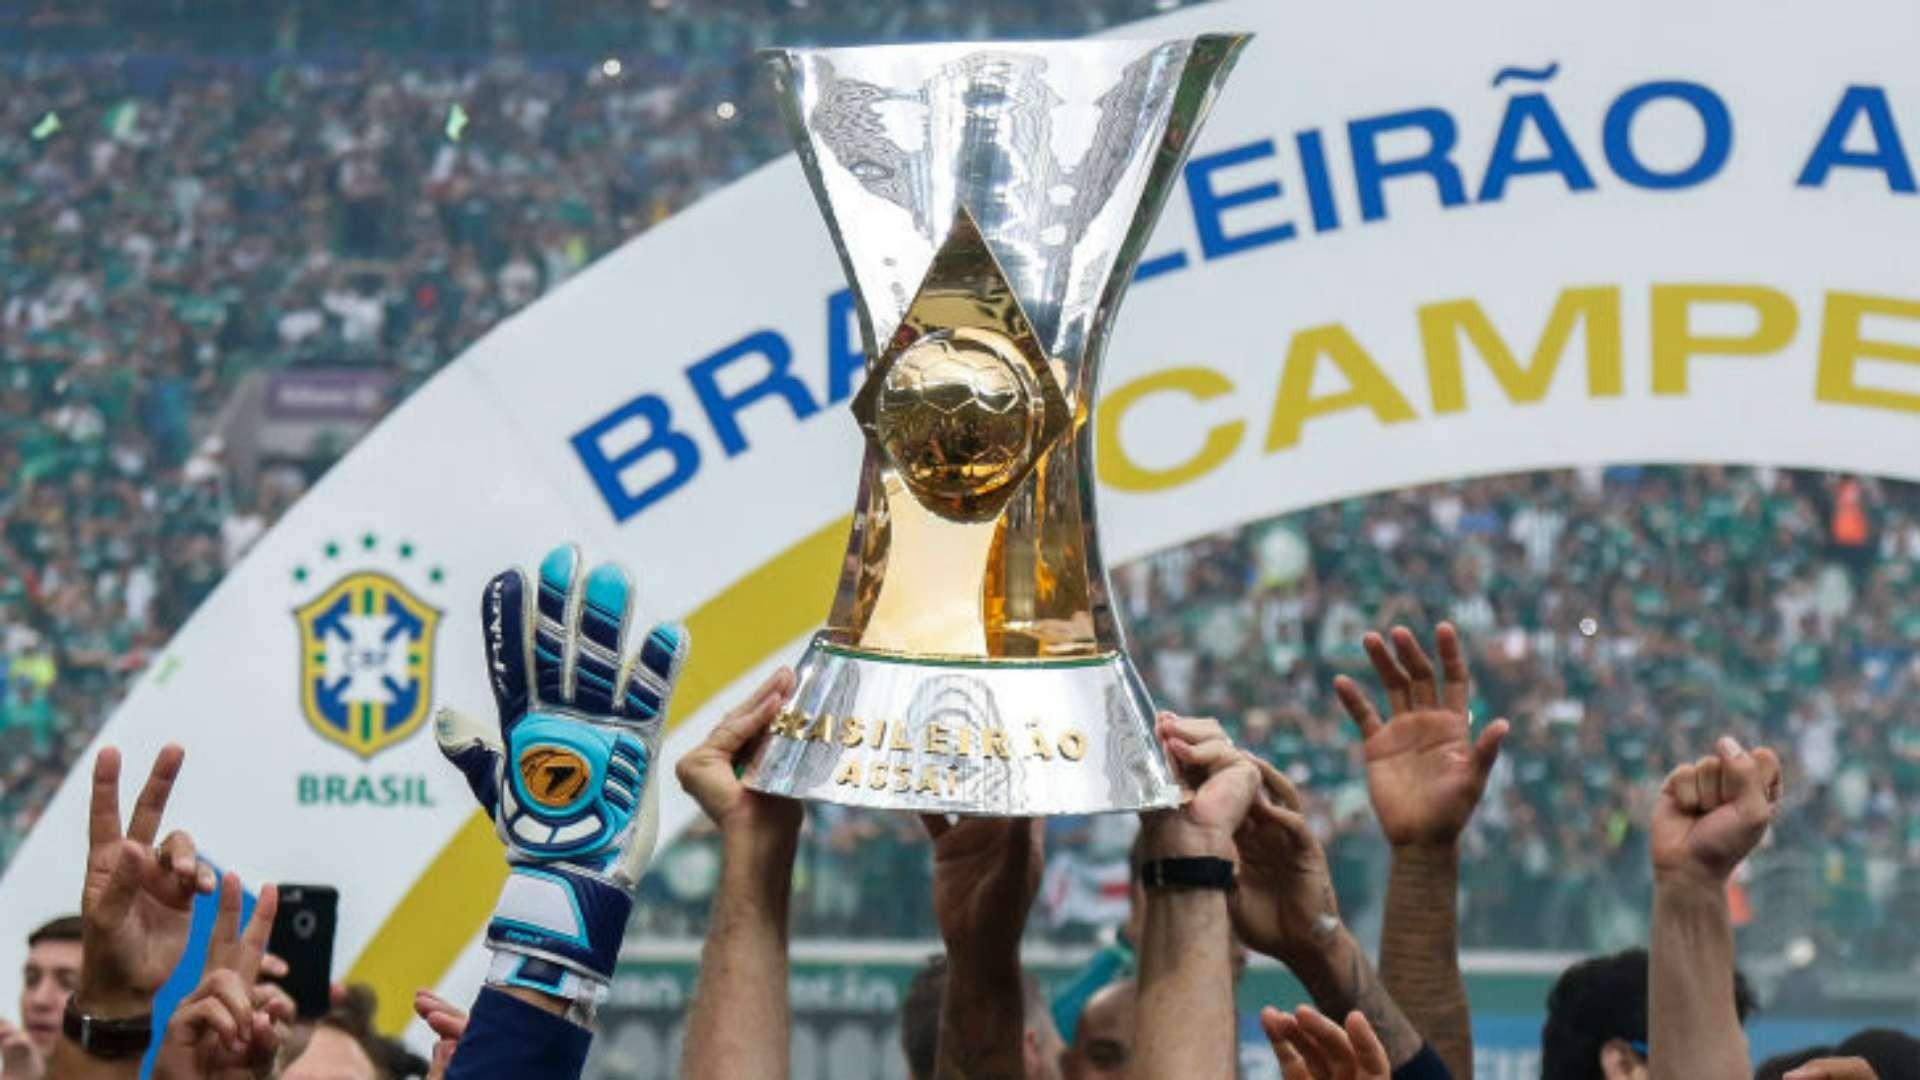 taca trofeu campeonato brasileiro brasileirao 2018 1sms7gzewcnj51hiauvd22eqx7